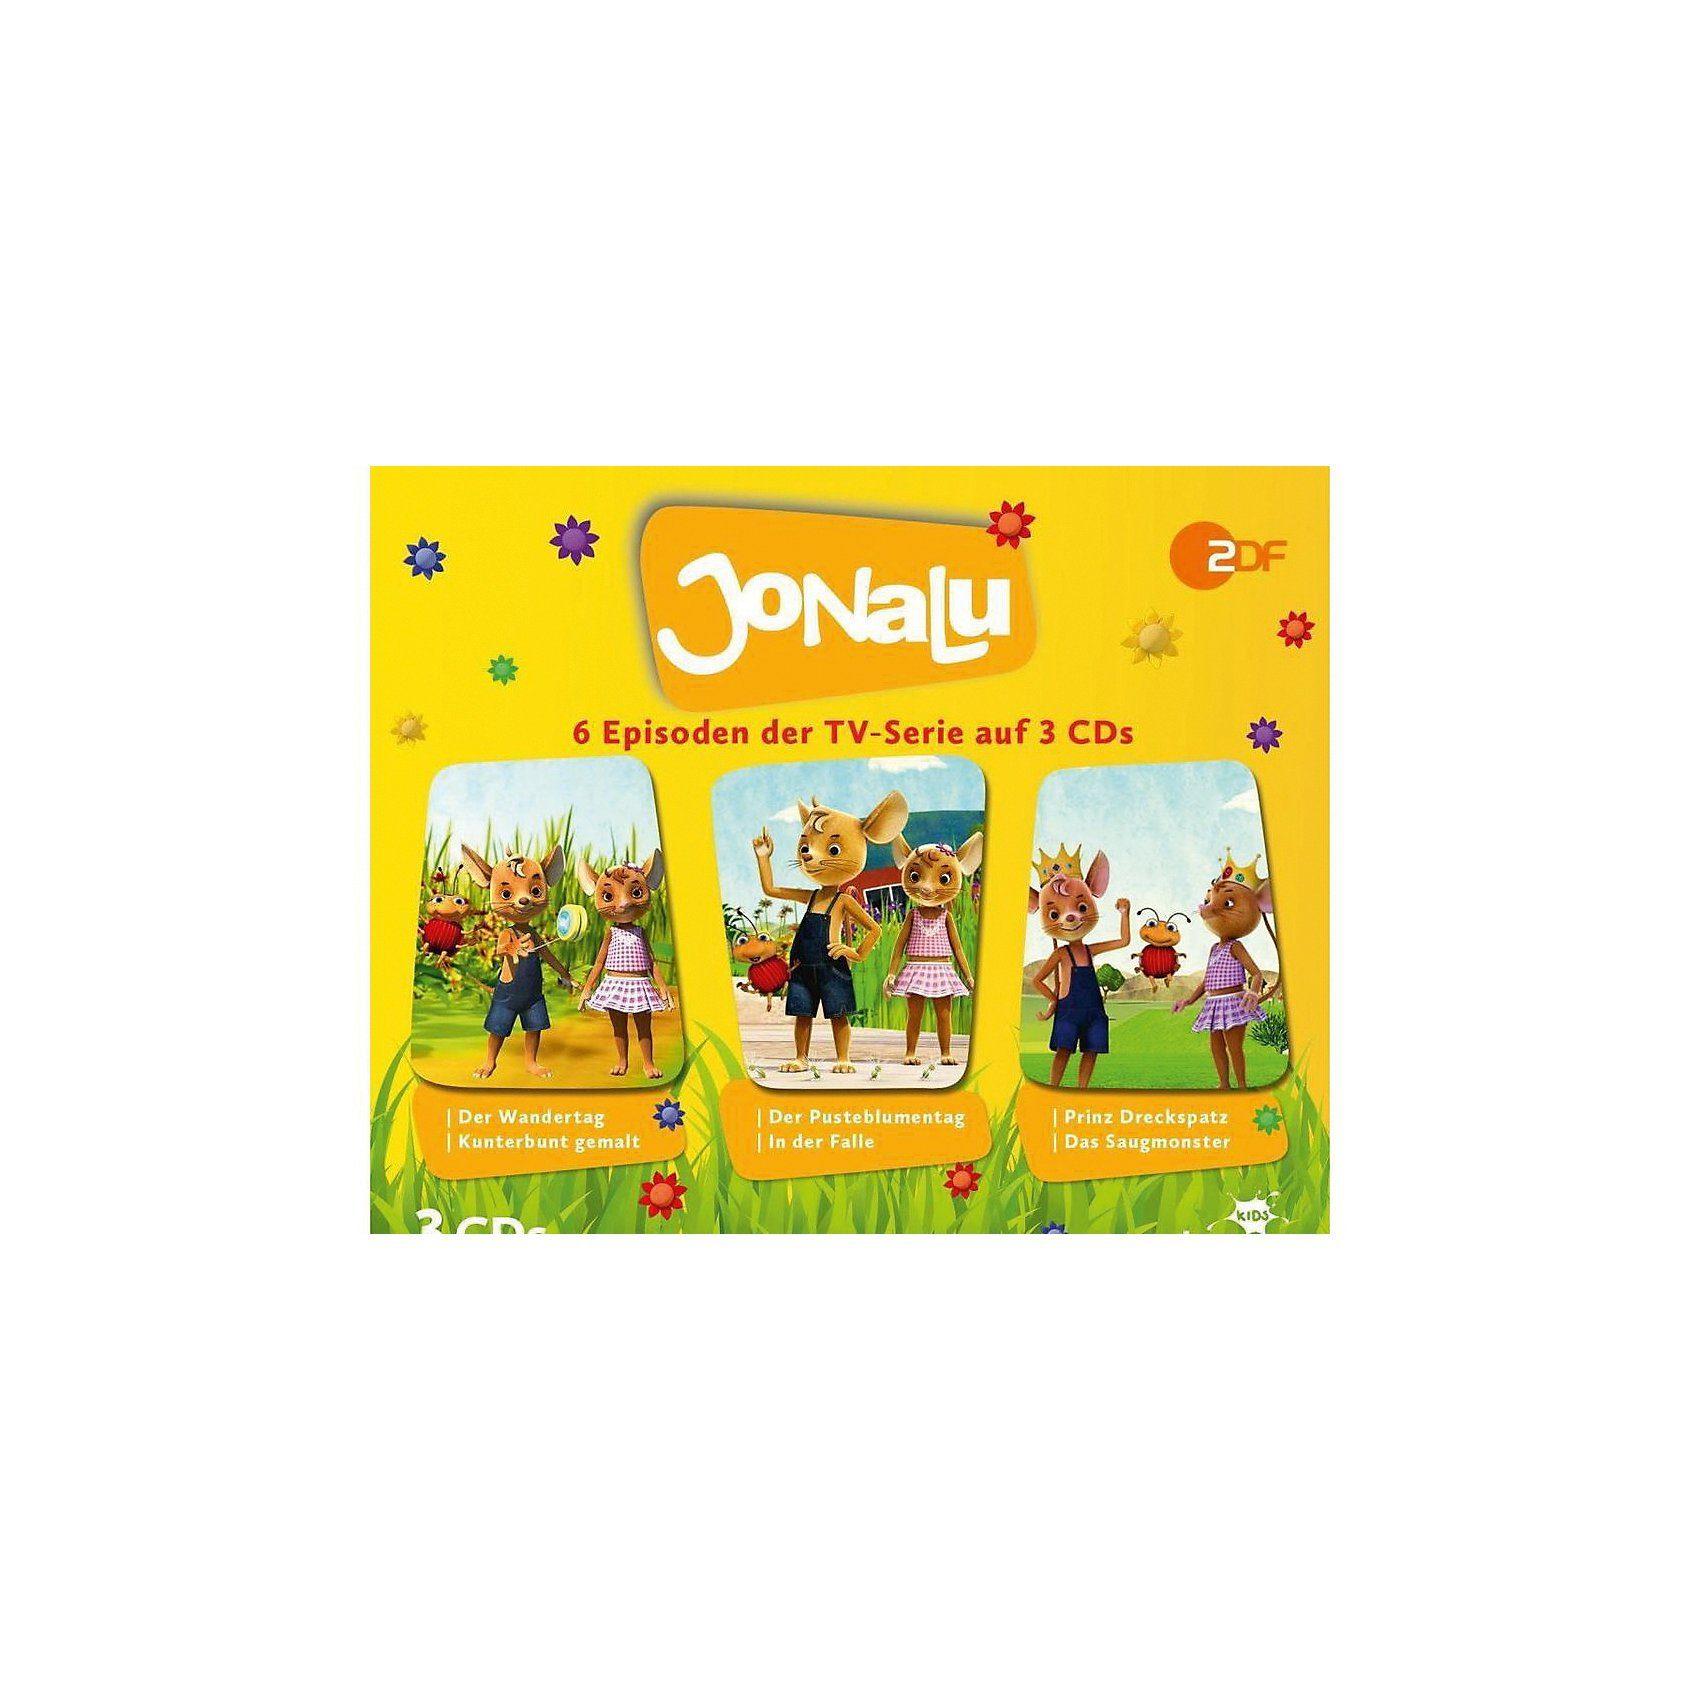 Universum CD Jonalu - Hörspielbox 1 (CD 1-3)